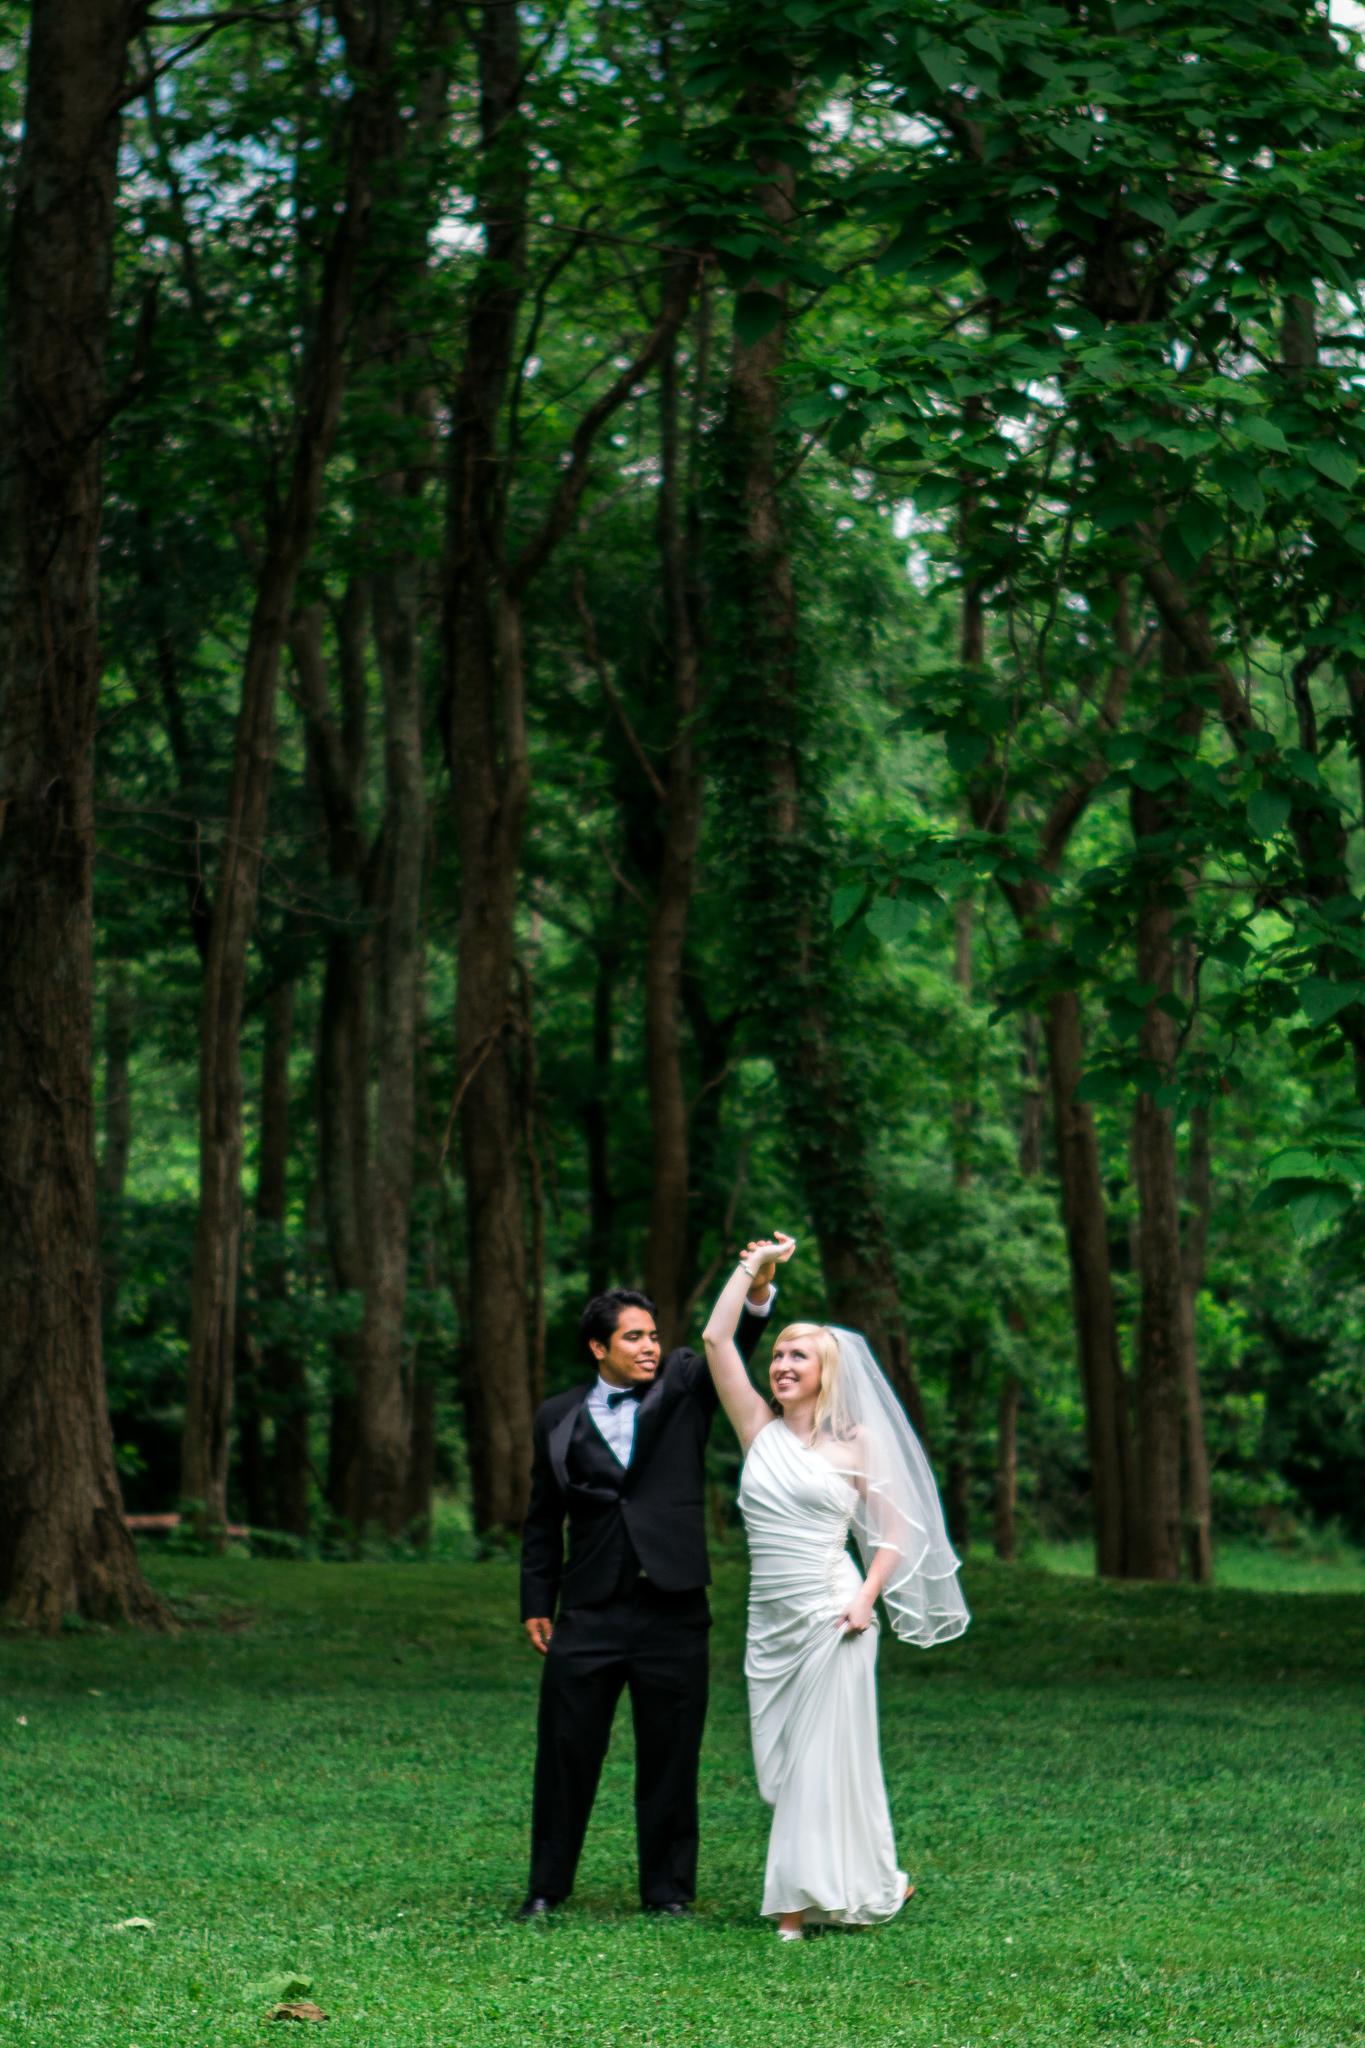 Richmond Kentucky Wedding Photographer - Ariana Jordan Photography -4-2.jpg